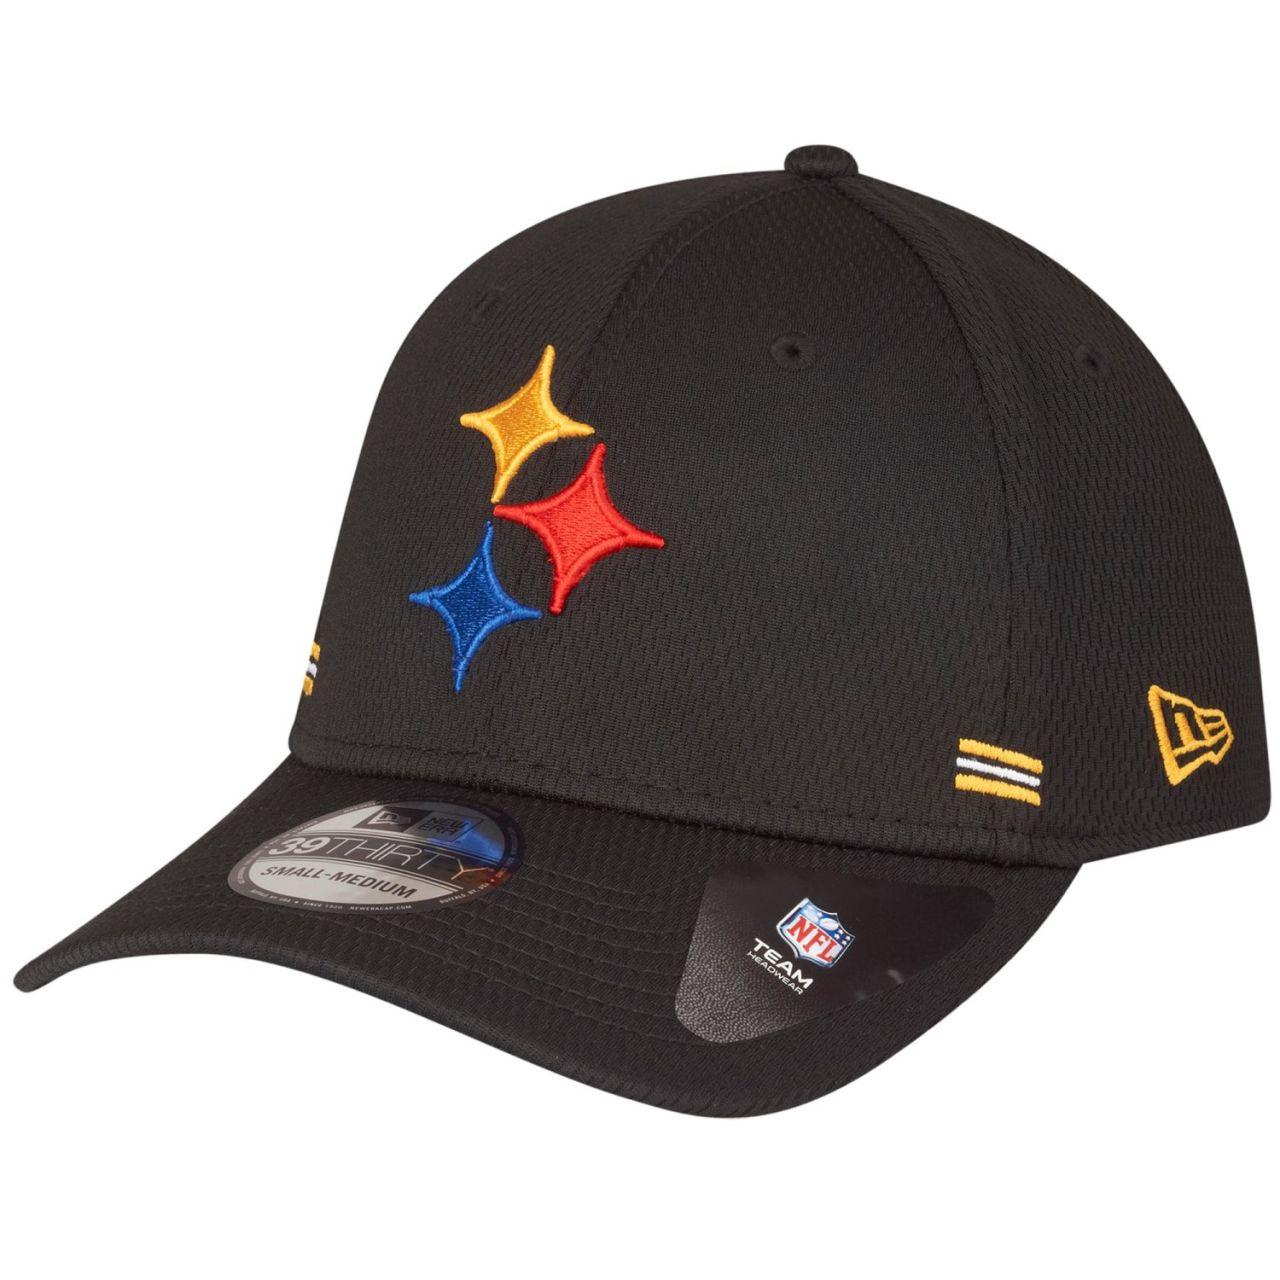 amfoo - New Era 39Thirty Cap - HOMETOWN Pittsburgh Steelers